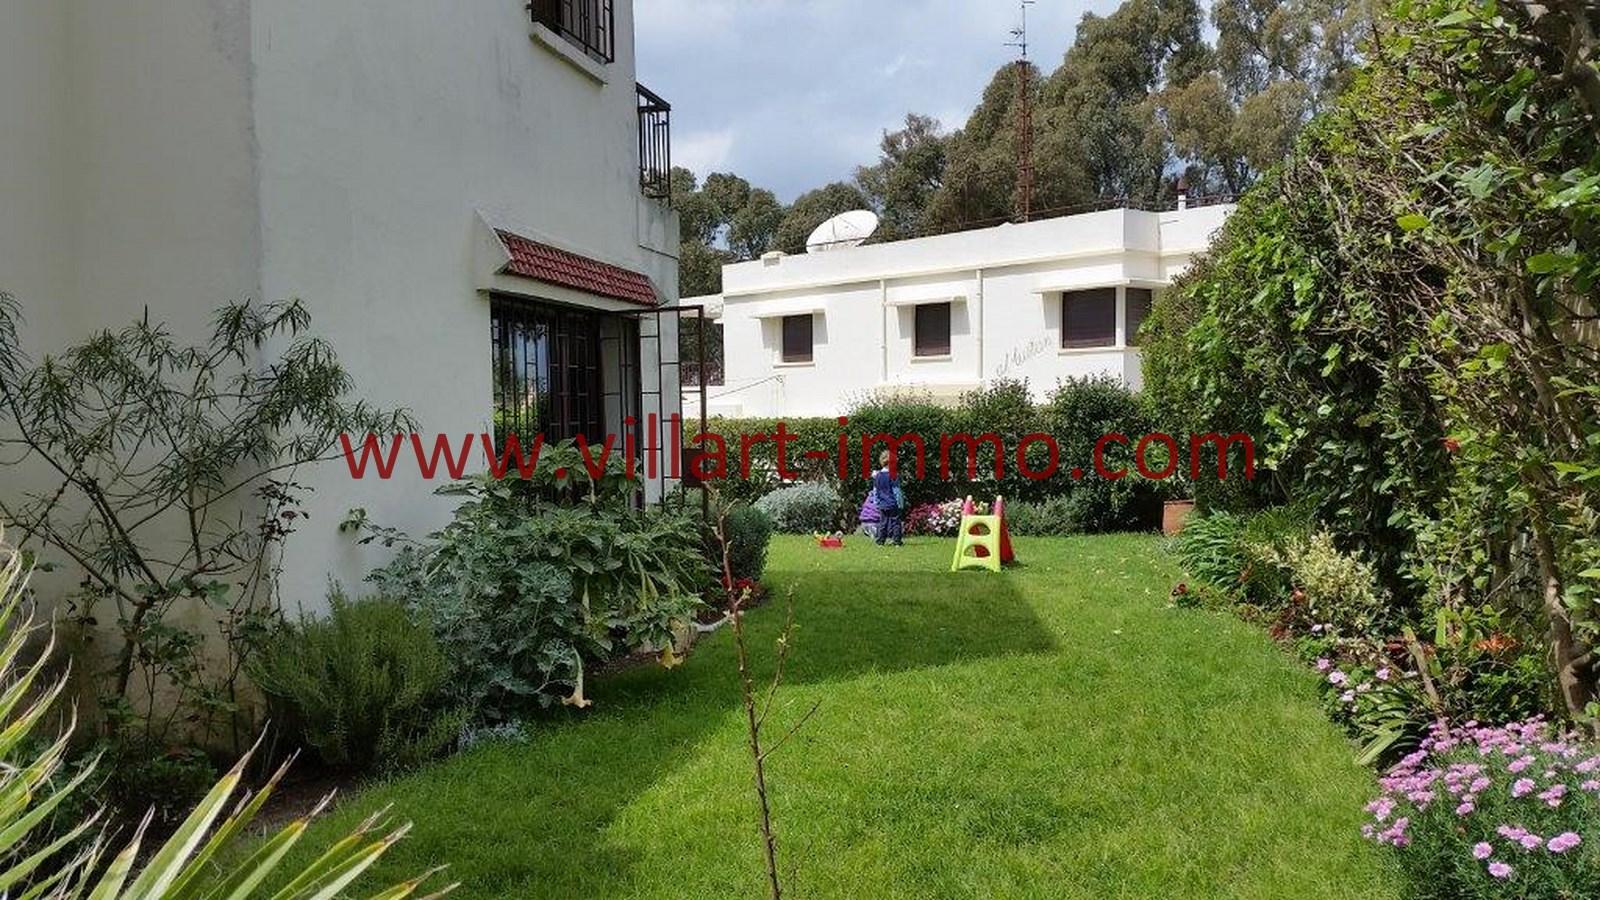 2-a-vendre-tanger-villa-californie-jardin-2-vv459-villart-immo-agence-immobiliere